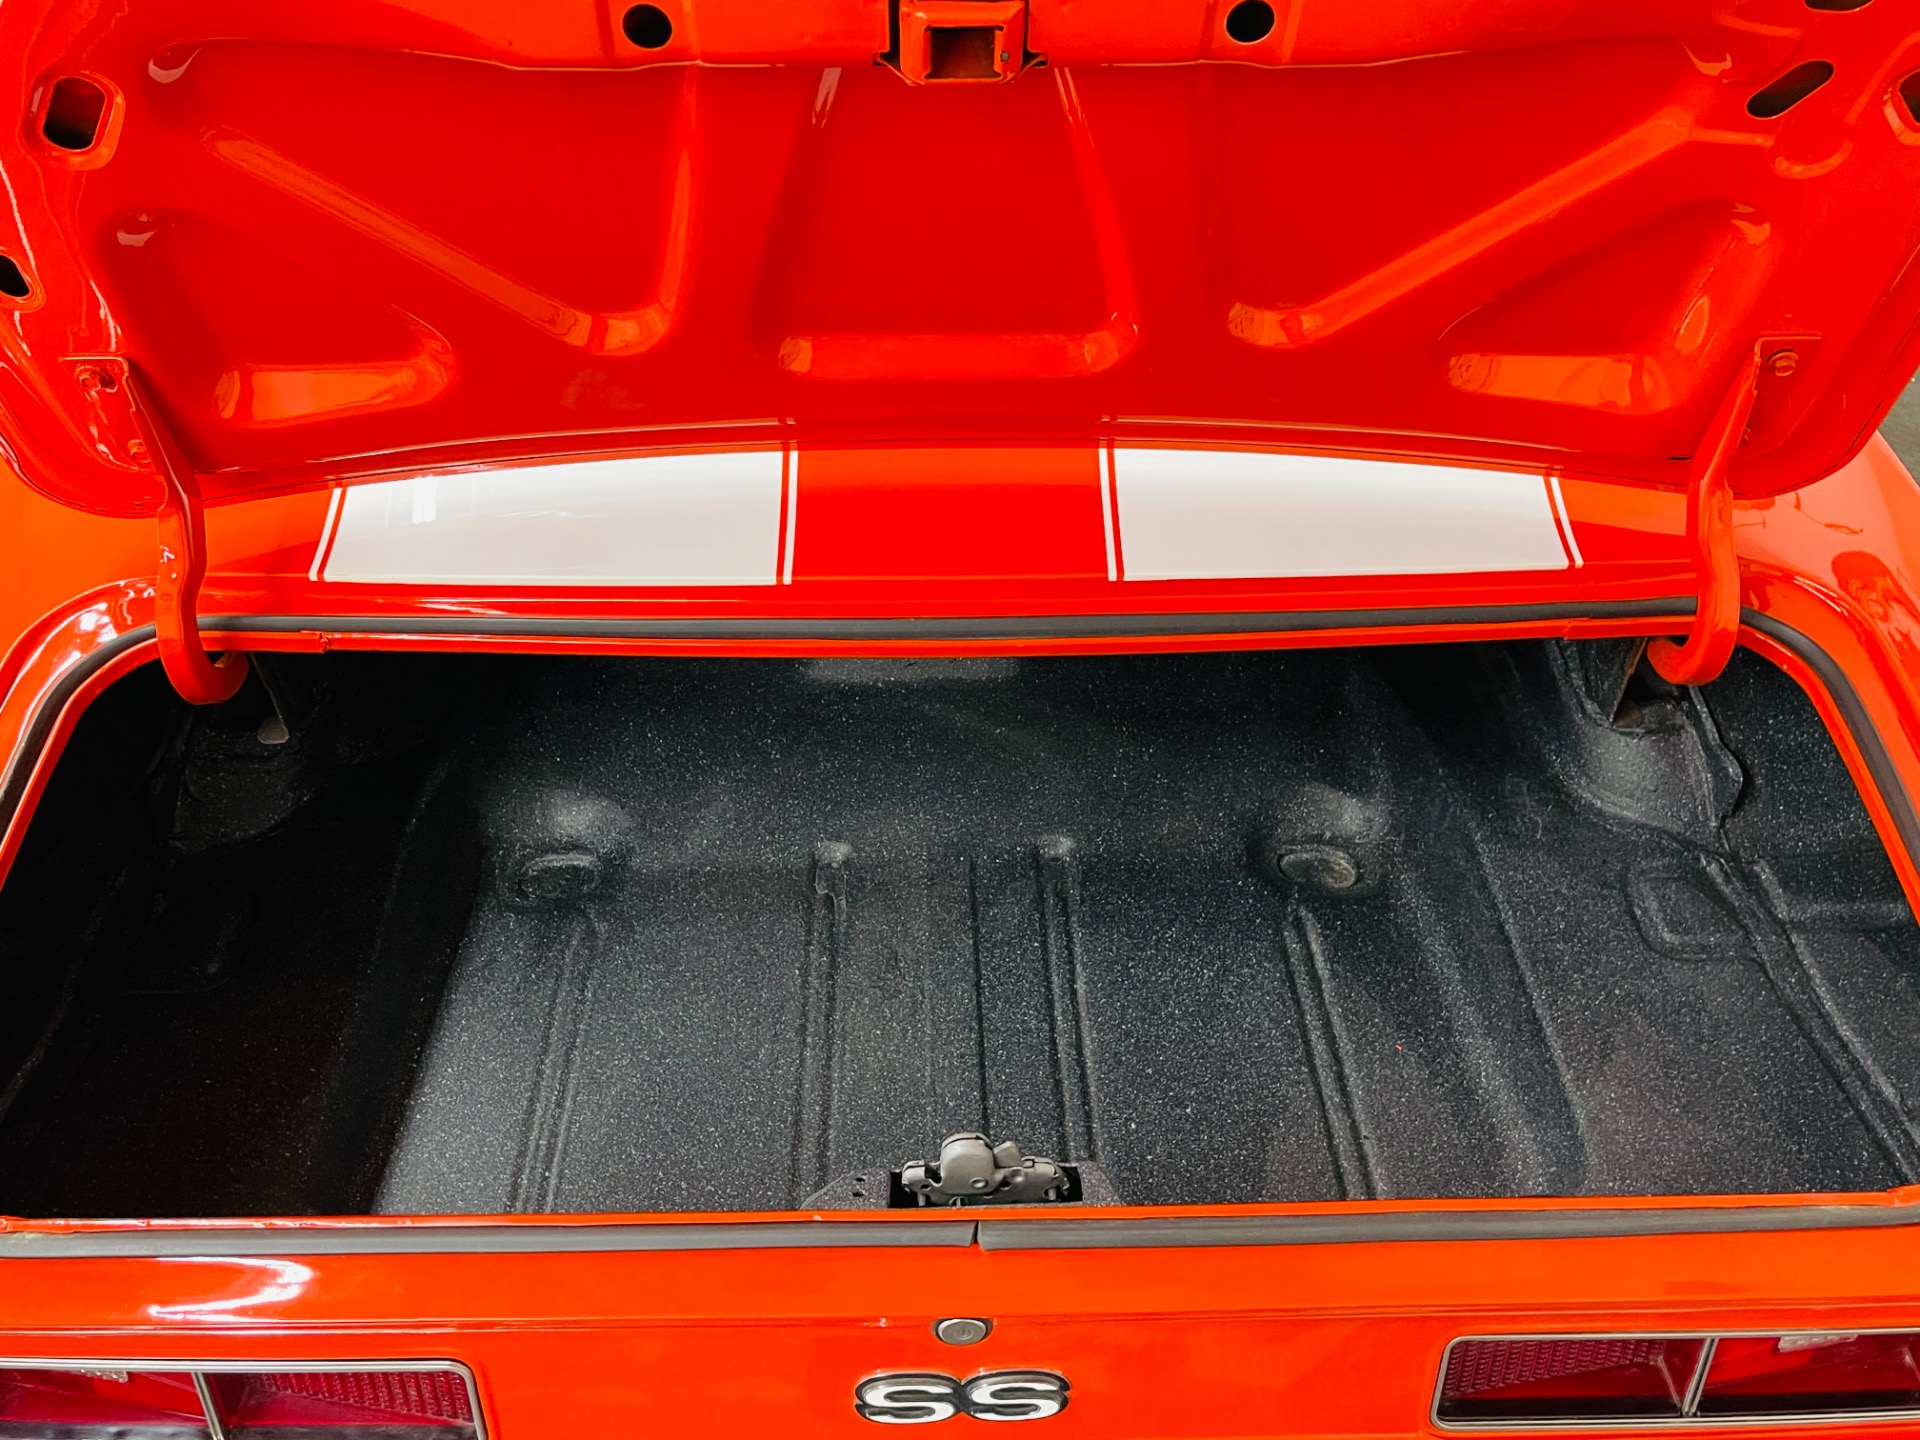 Used 1969 Chevrolet Camaro - SS 350 - HUGGER ORANGE - HOUNDSTOOTH INTERIOR - SEE VIDEO - | Mundelein, IL